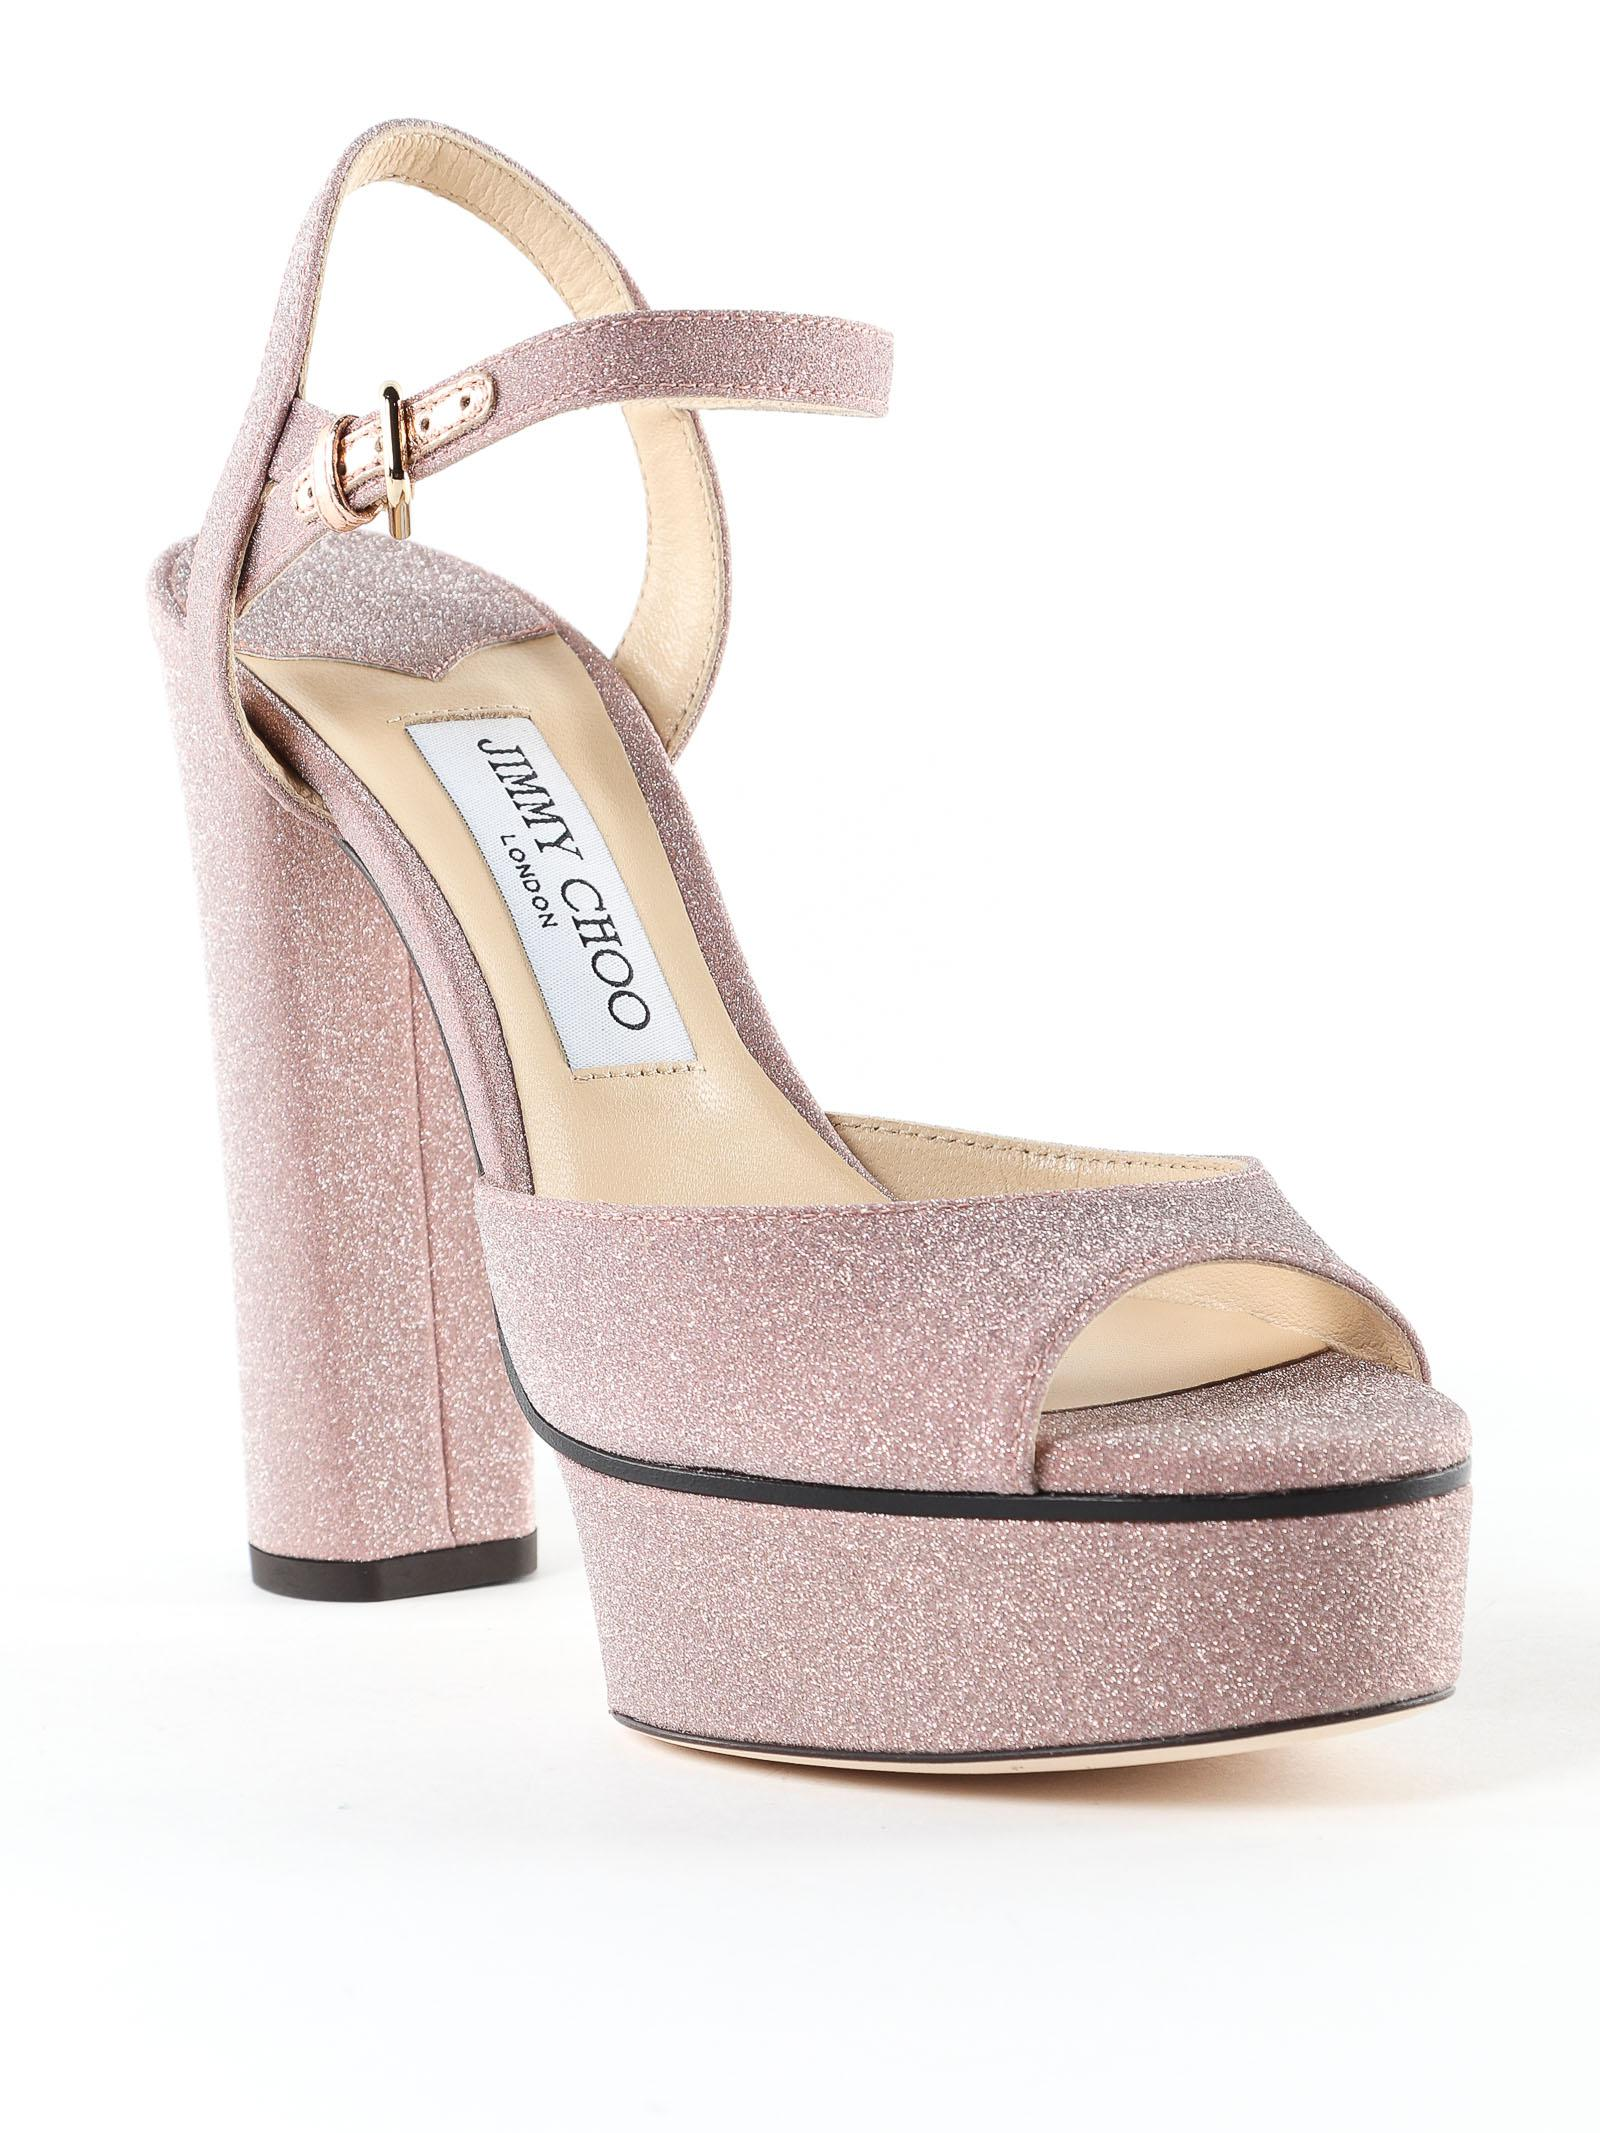 d0a3eb3a191 Jimmy Choo Fine Glitter Fabric Sandal in Pink - Lyst